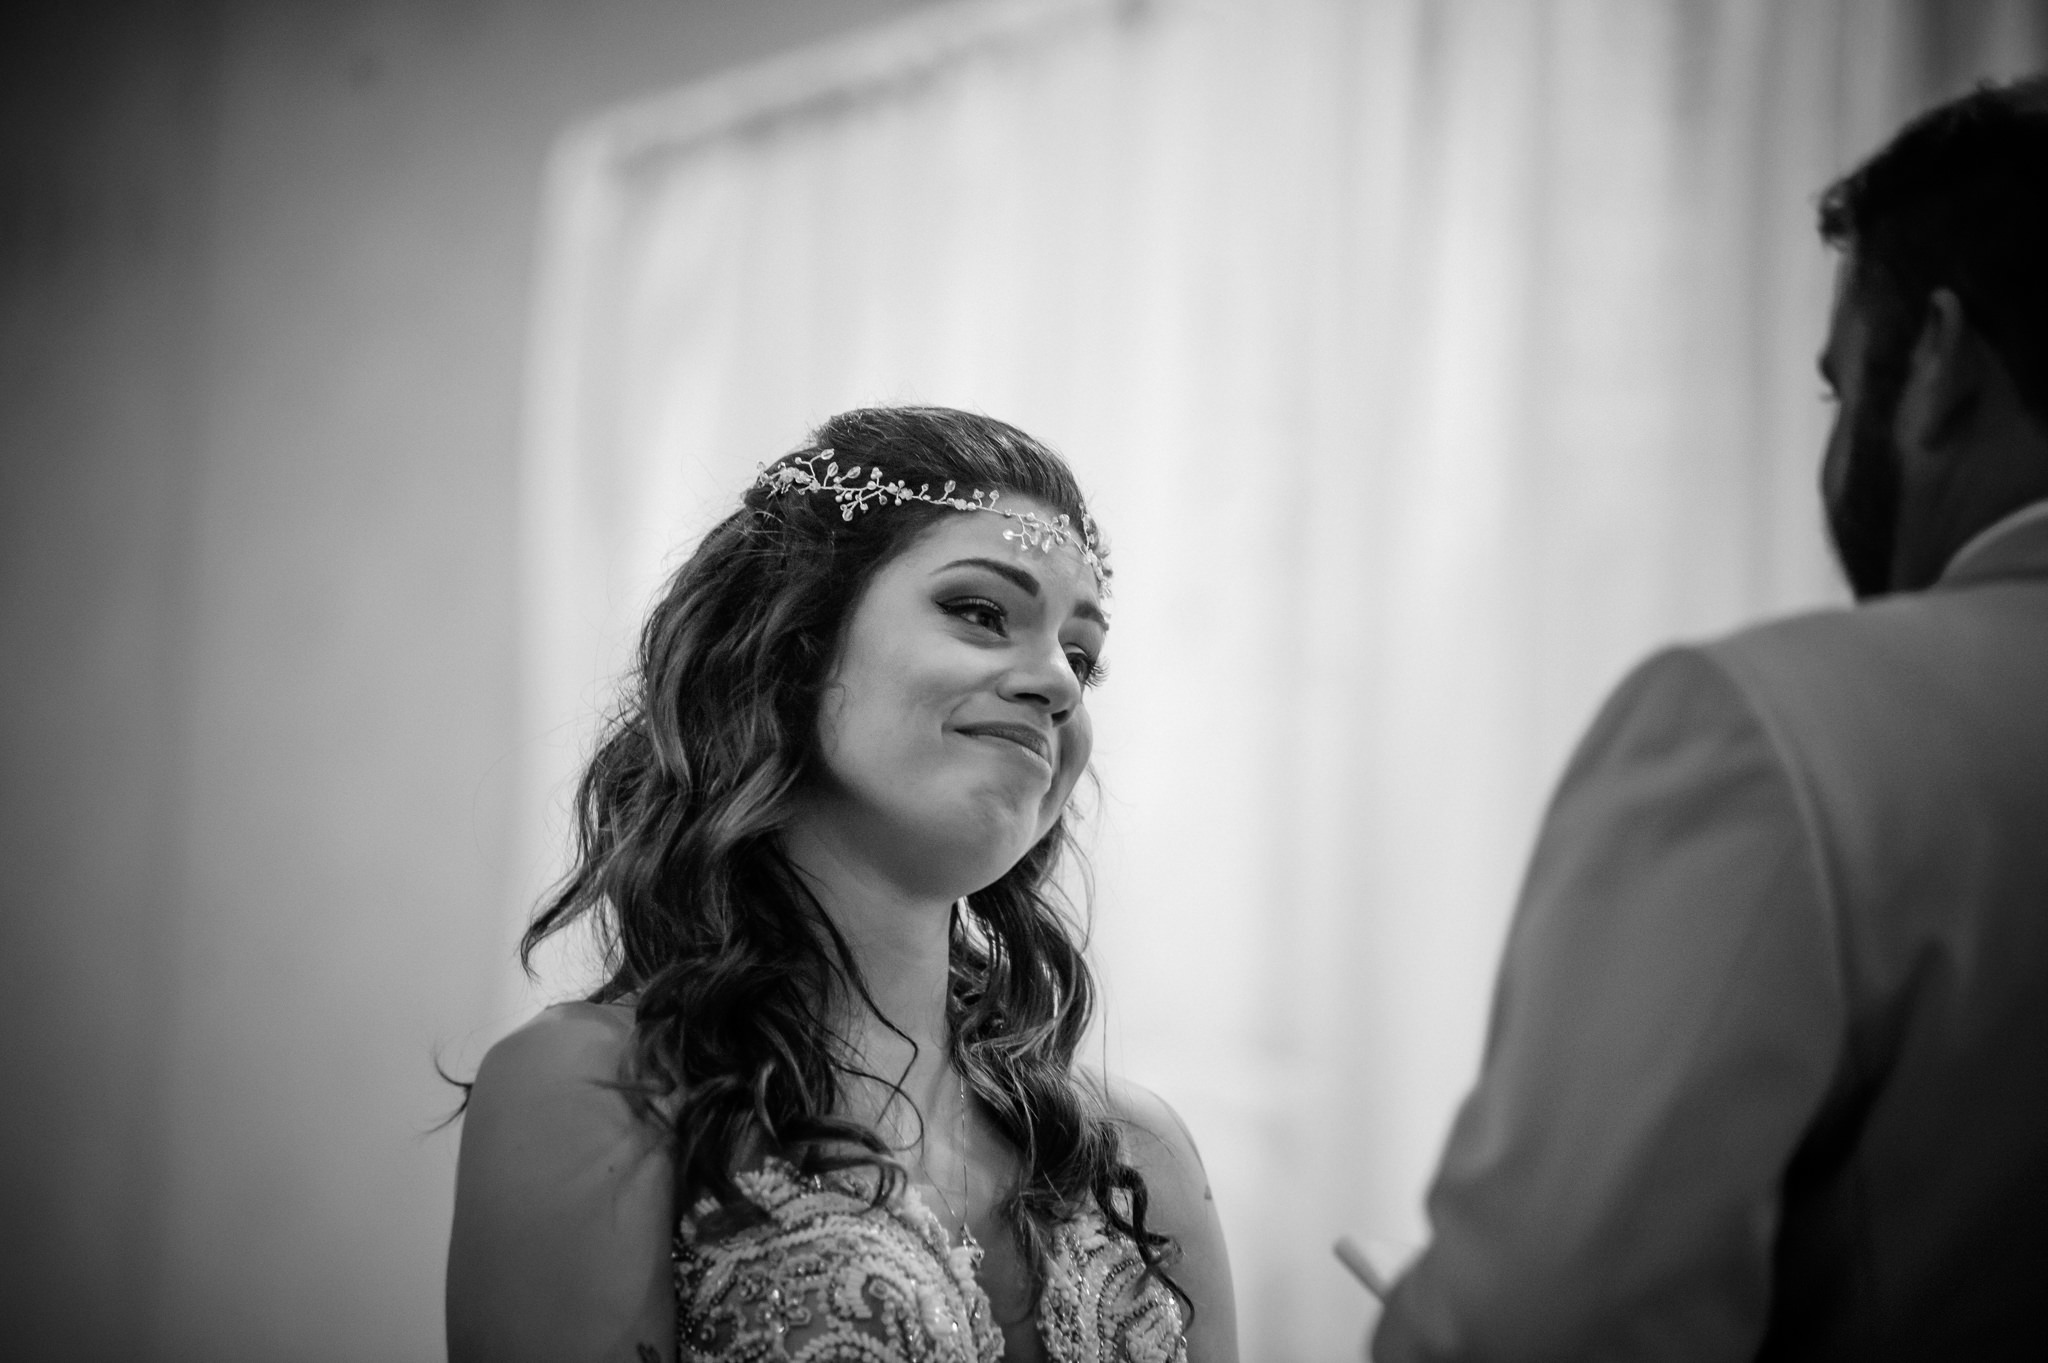 HILTON-OMAHA-WEDDING-PHOTOGRAPHER-JM-STUDIOS-OMAHA-LIV-BRICE-027.jpg